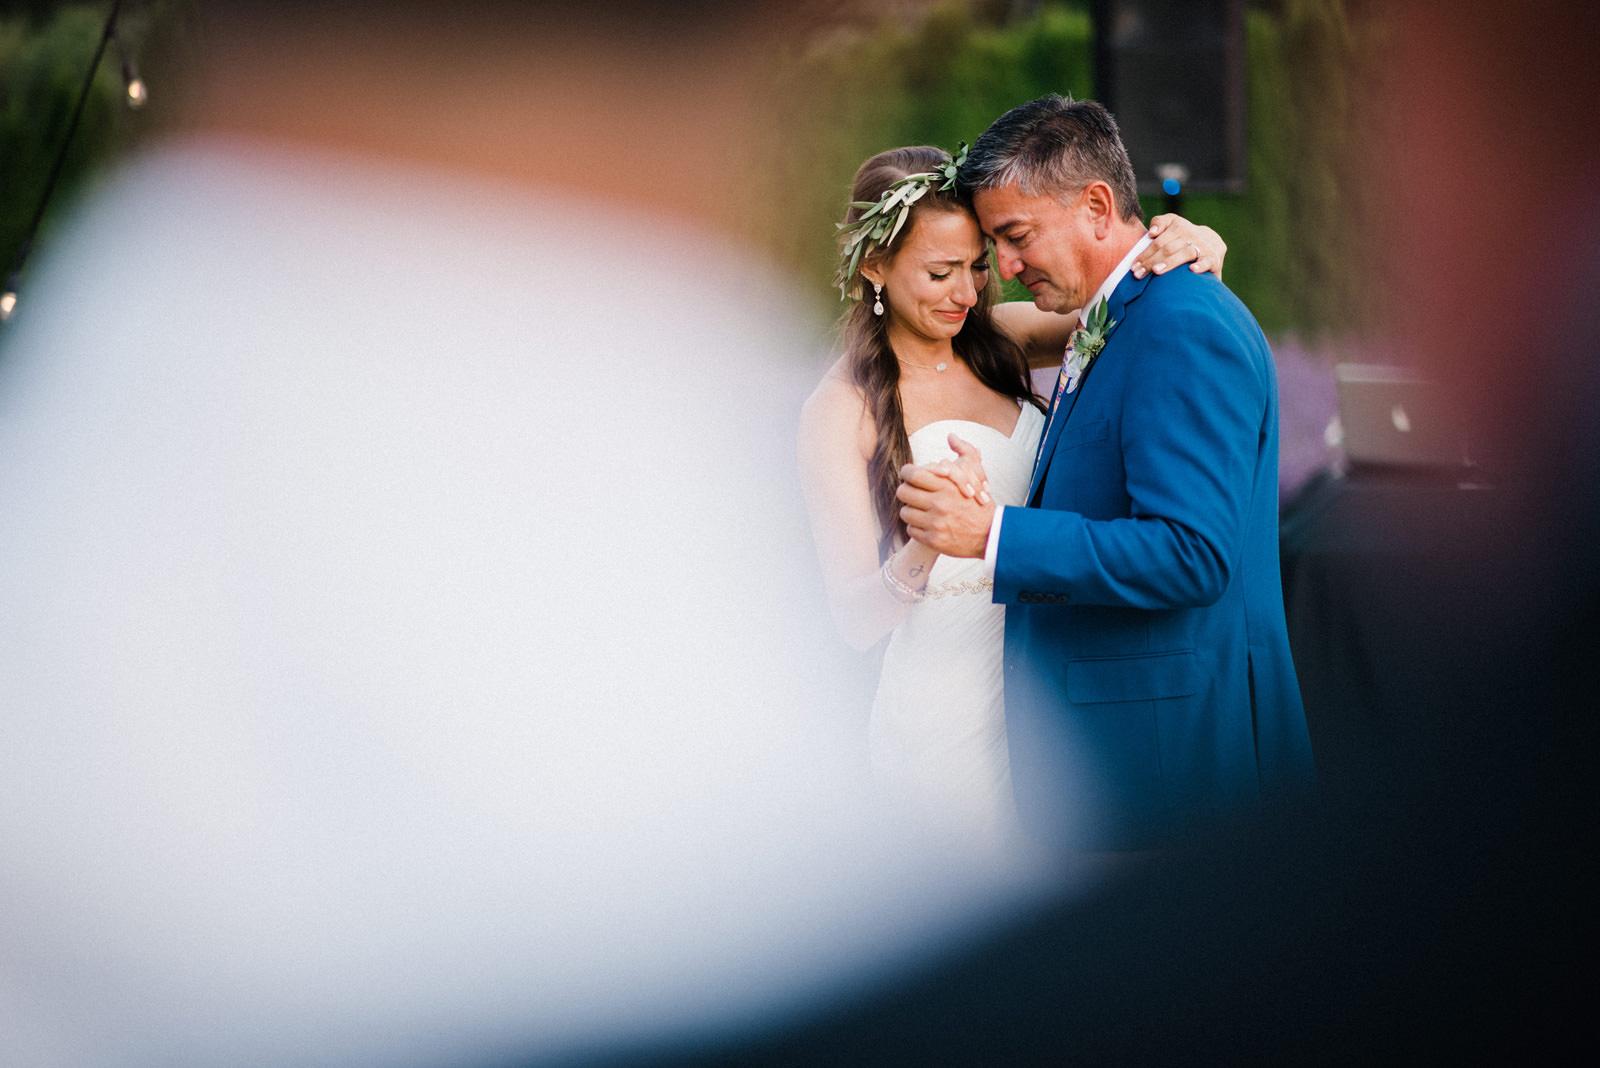 087-woodinville-lavendar-farm-wedding-with-golden-glowy-photos.jpg